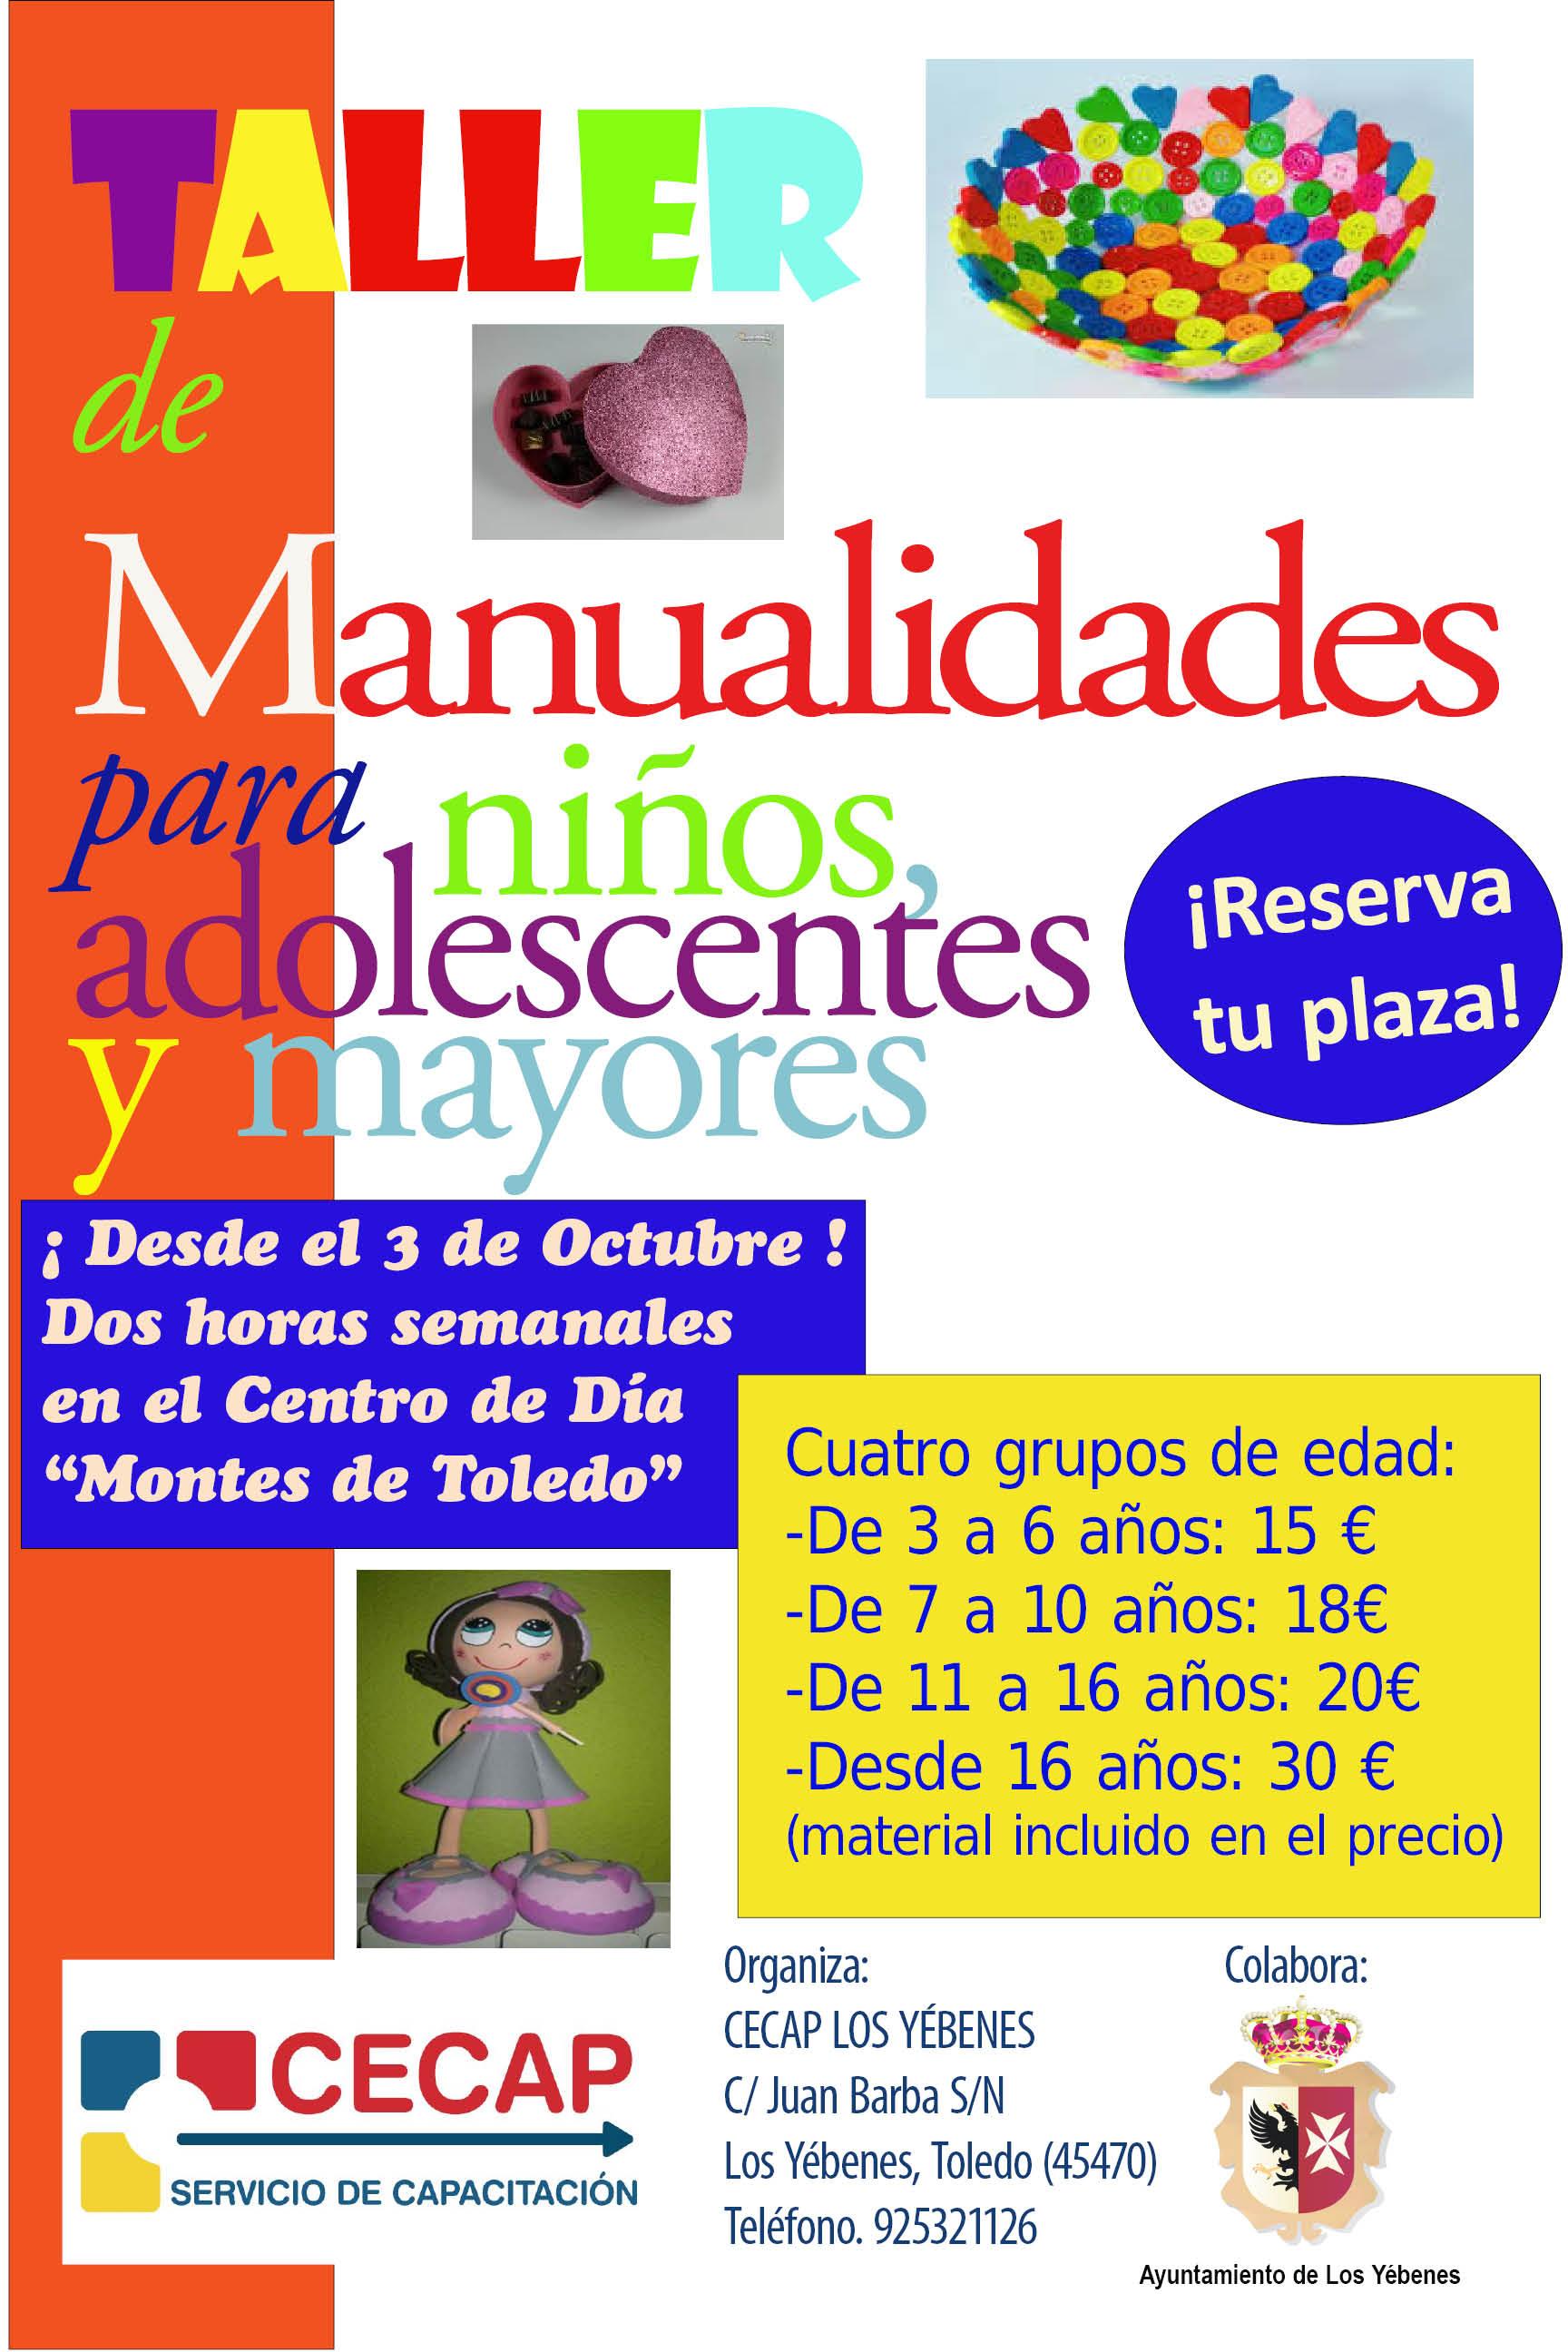 Talleres de manualidades manualidades para jovenes adultos - Talleres manualidades para adultos ...